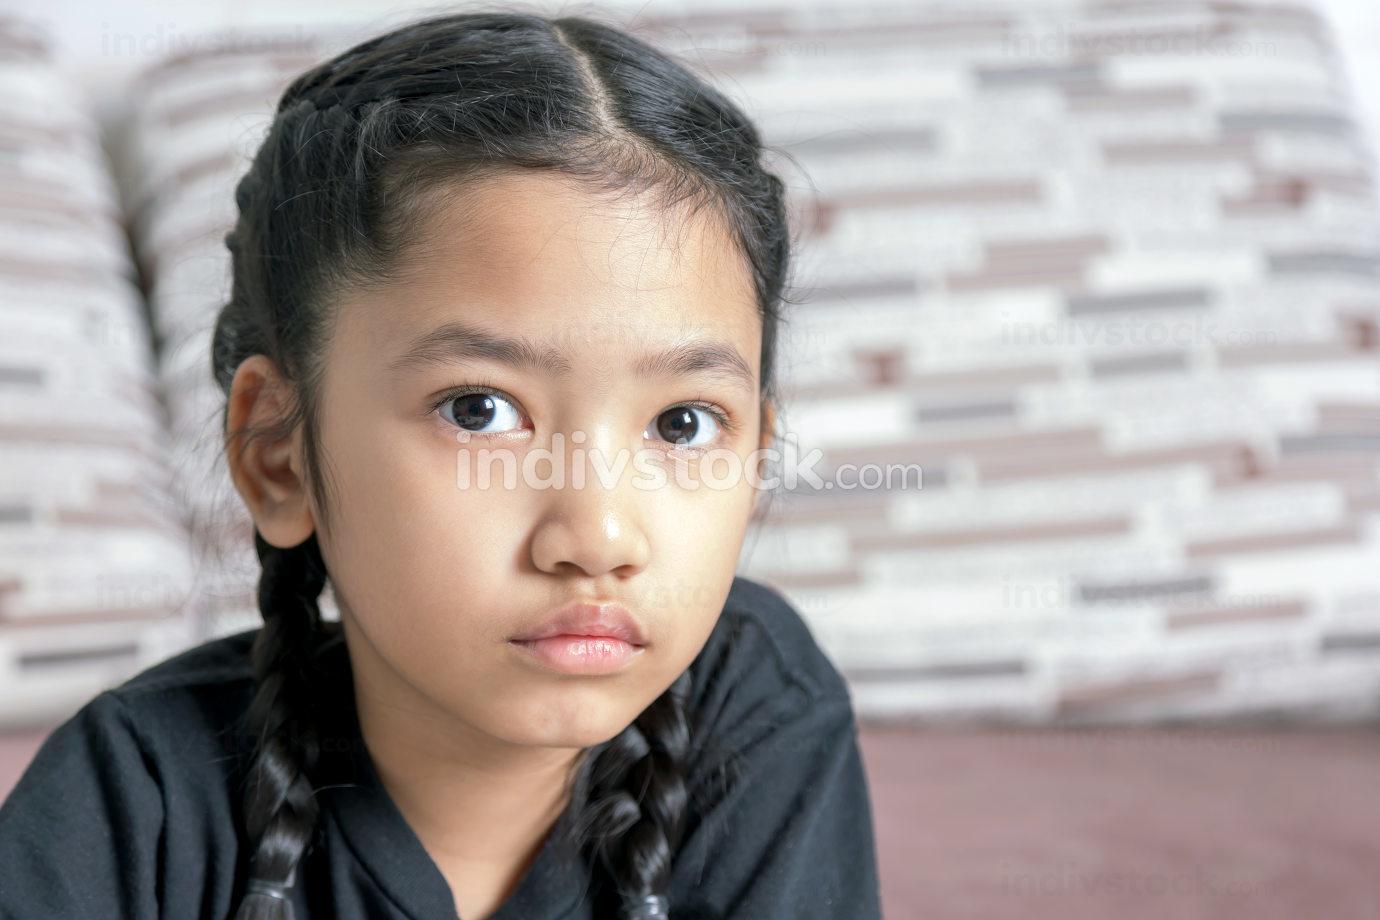 A little Asian girl in a black braid